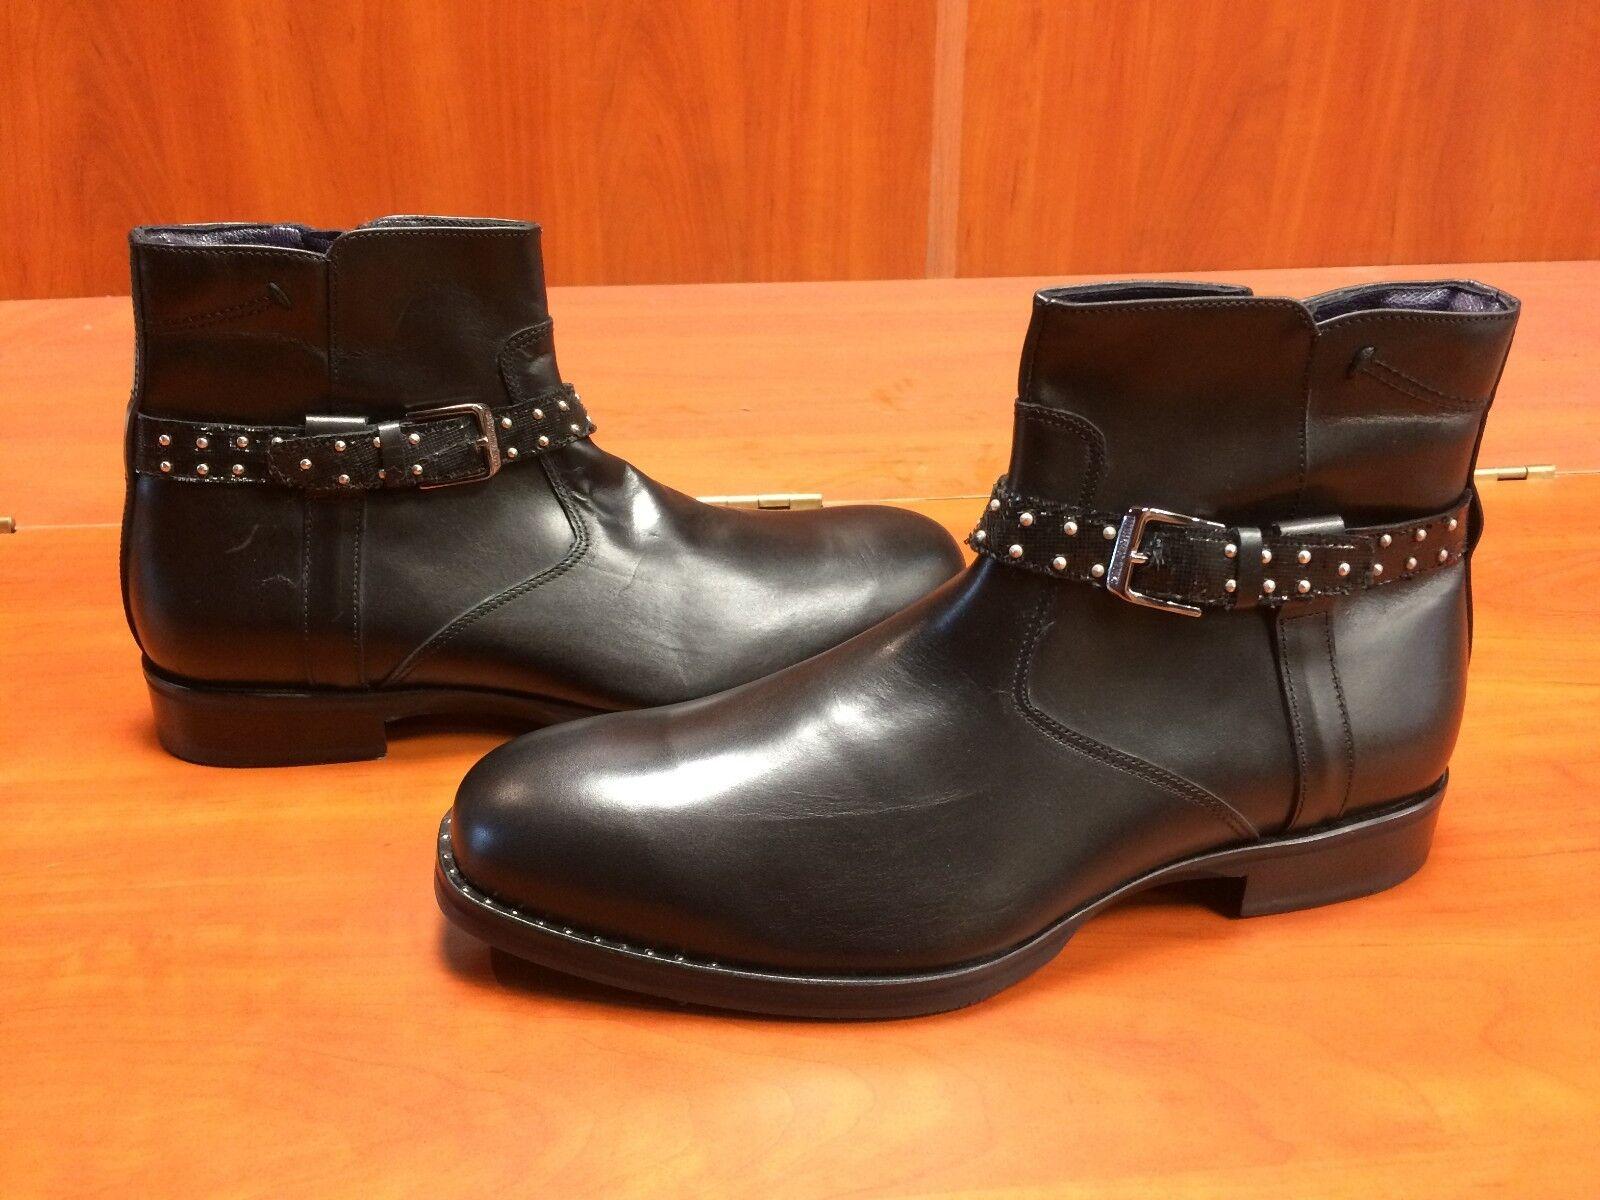 Mini-bottes   CARLO PIGNATELLi   Pointure 44  réf  27z 8133-R